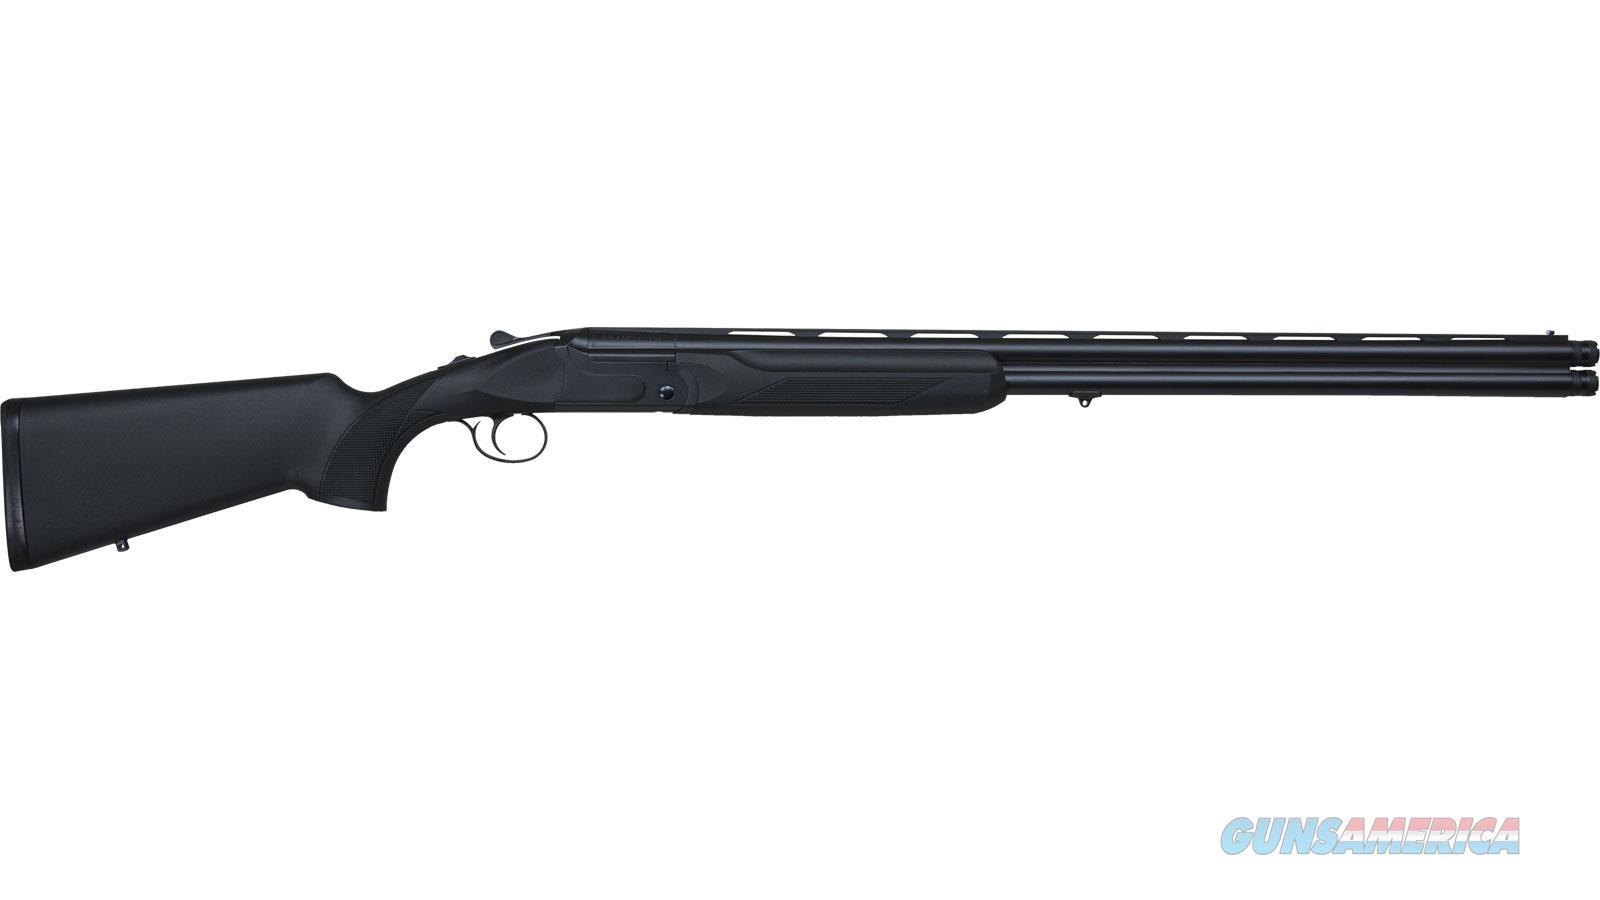 Cz Usa Swamp Magnum 12Ga 3.5 30 Blk Syn 06584  Guns > Shotguns > C Misc Shotguns